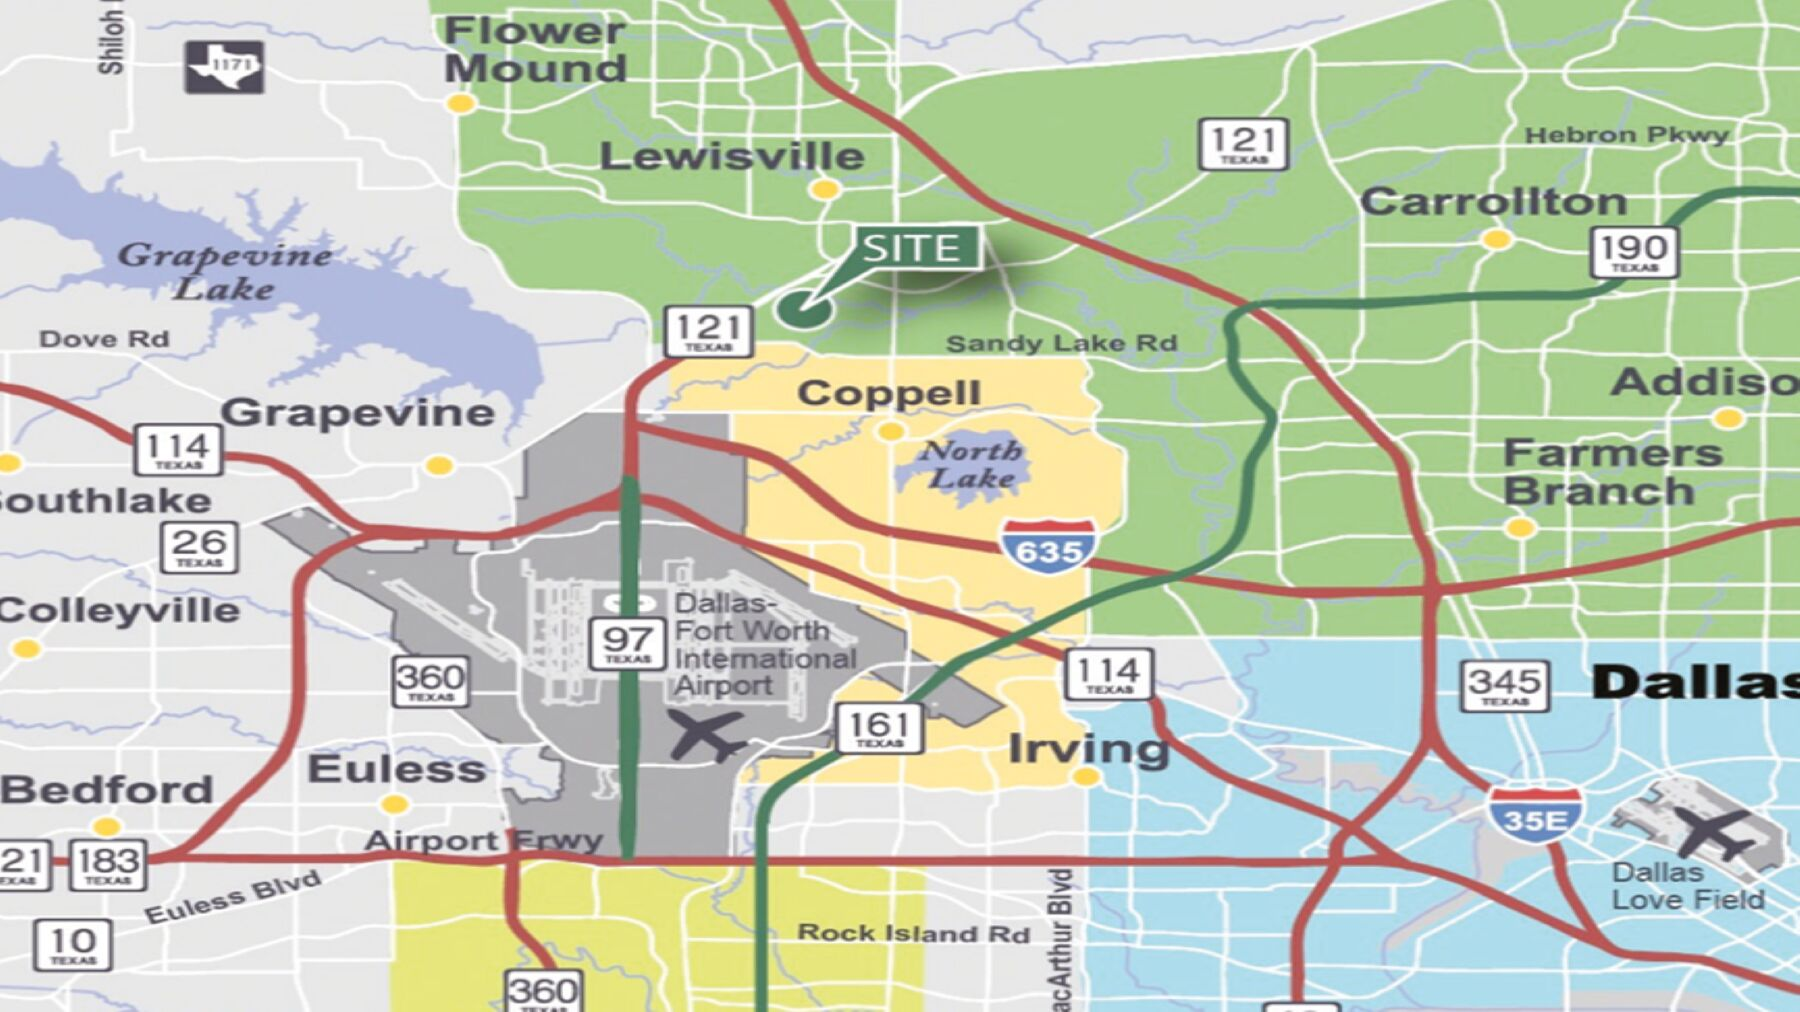 DPM-Prologis-Park-121-Building-1-6-DAL05401-DAL05402-DAL05403-DAL05404-DAL05405-DAL05406-DAL05407-DAL05408-N-Freeport-Parkway_AerialMap.jpg